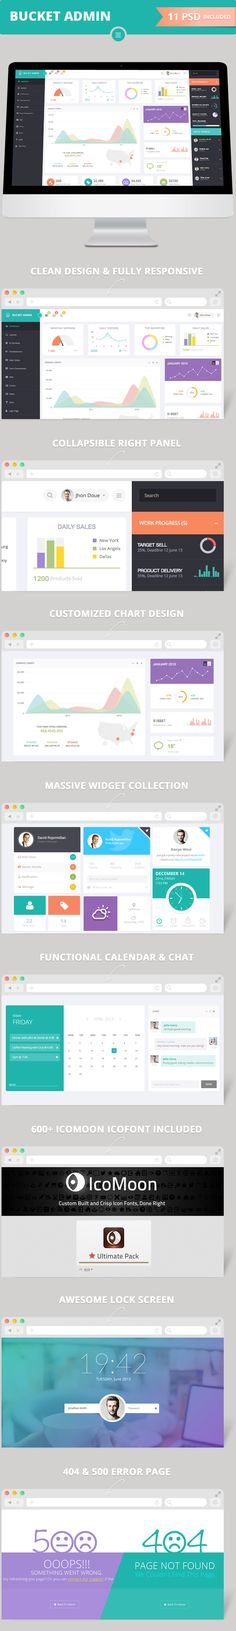 Site Templates - Bucket Admin Bootstrap 3 Responsive Flat Dashboard | ThemeForest